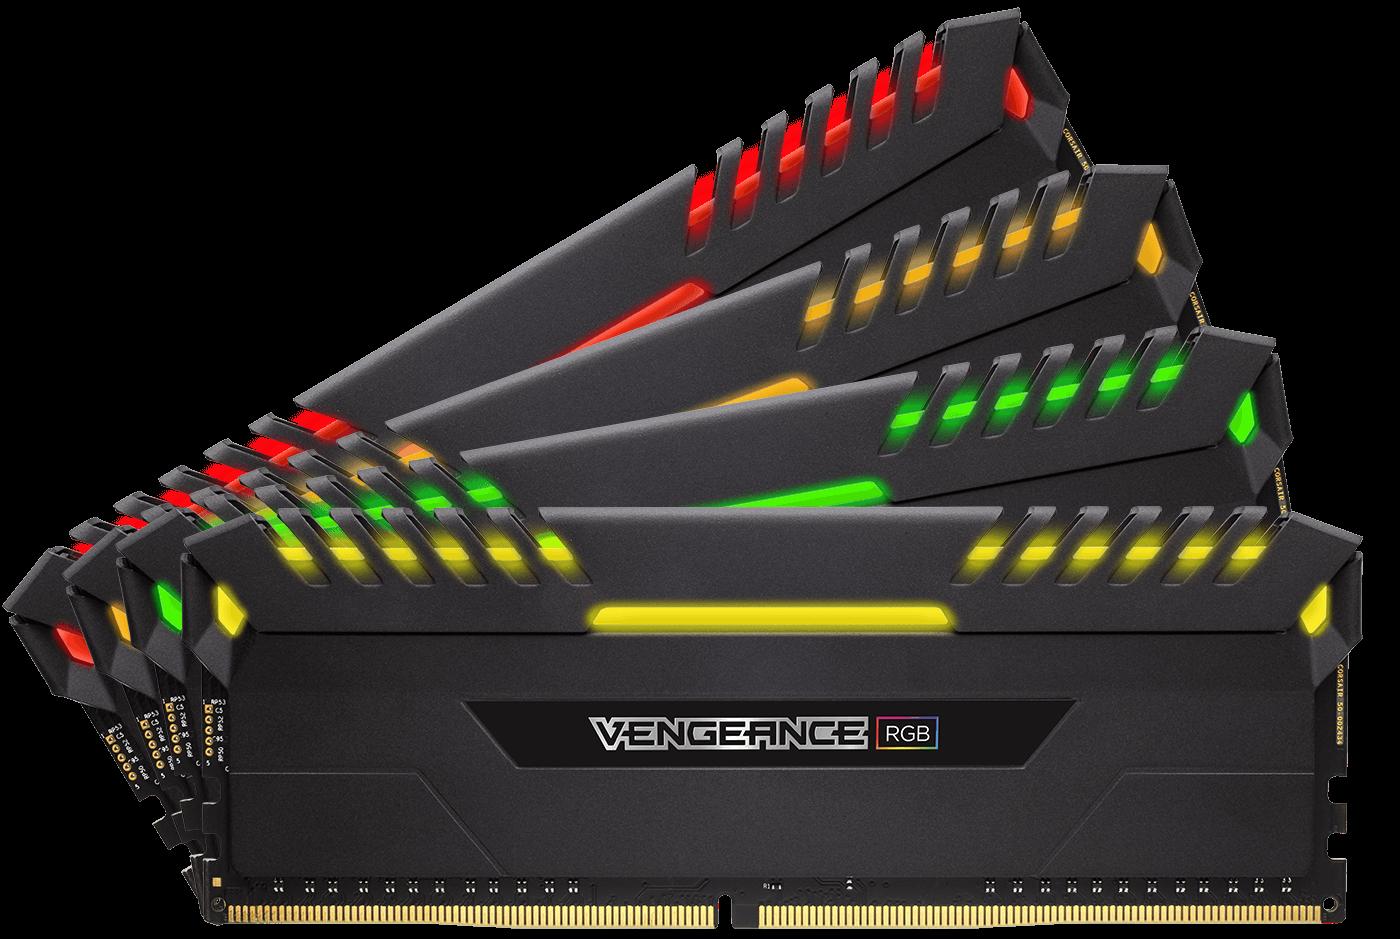 Memorie Desktop Corsair Vengeance RGB 64GB(4 x 16GB) DDR4 3333MHz